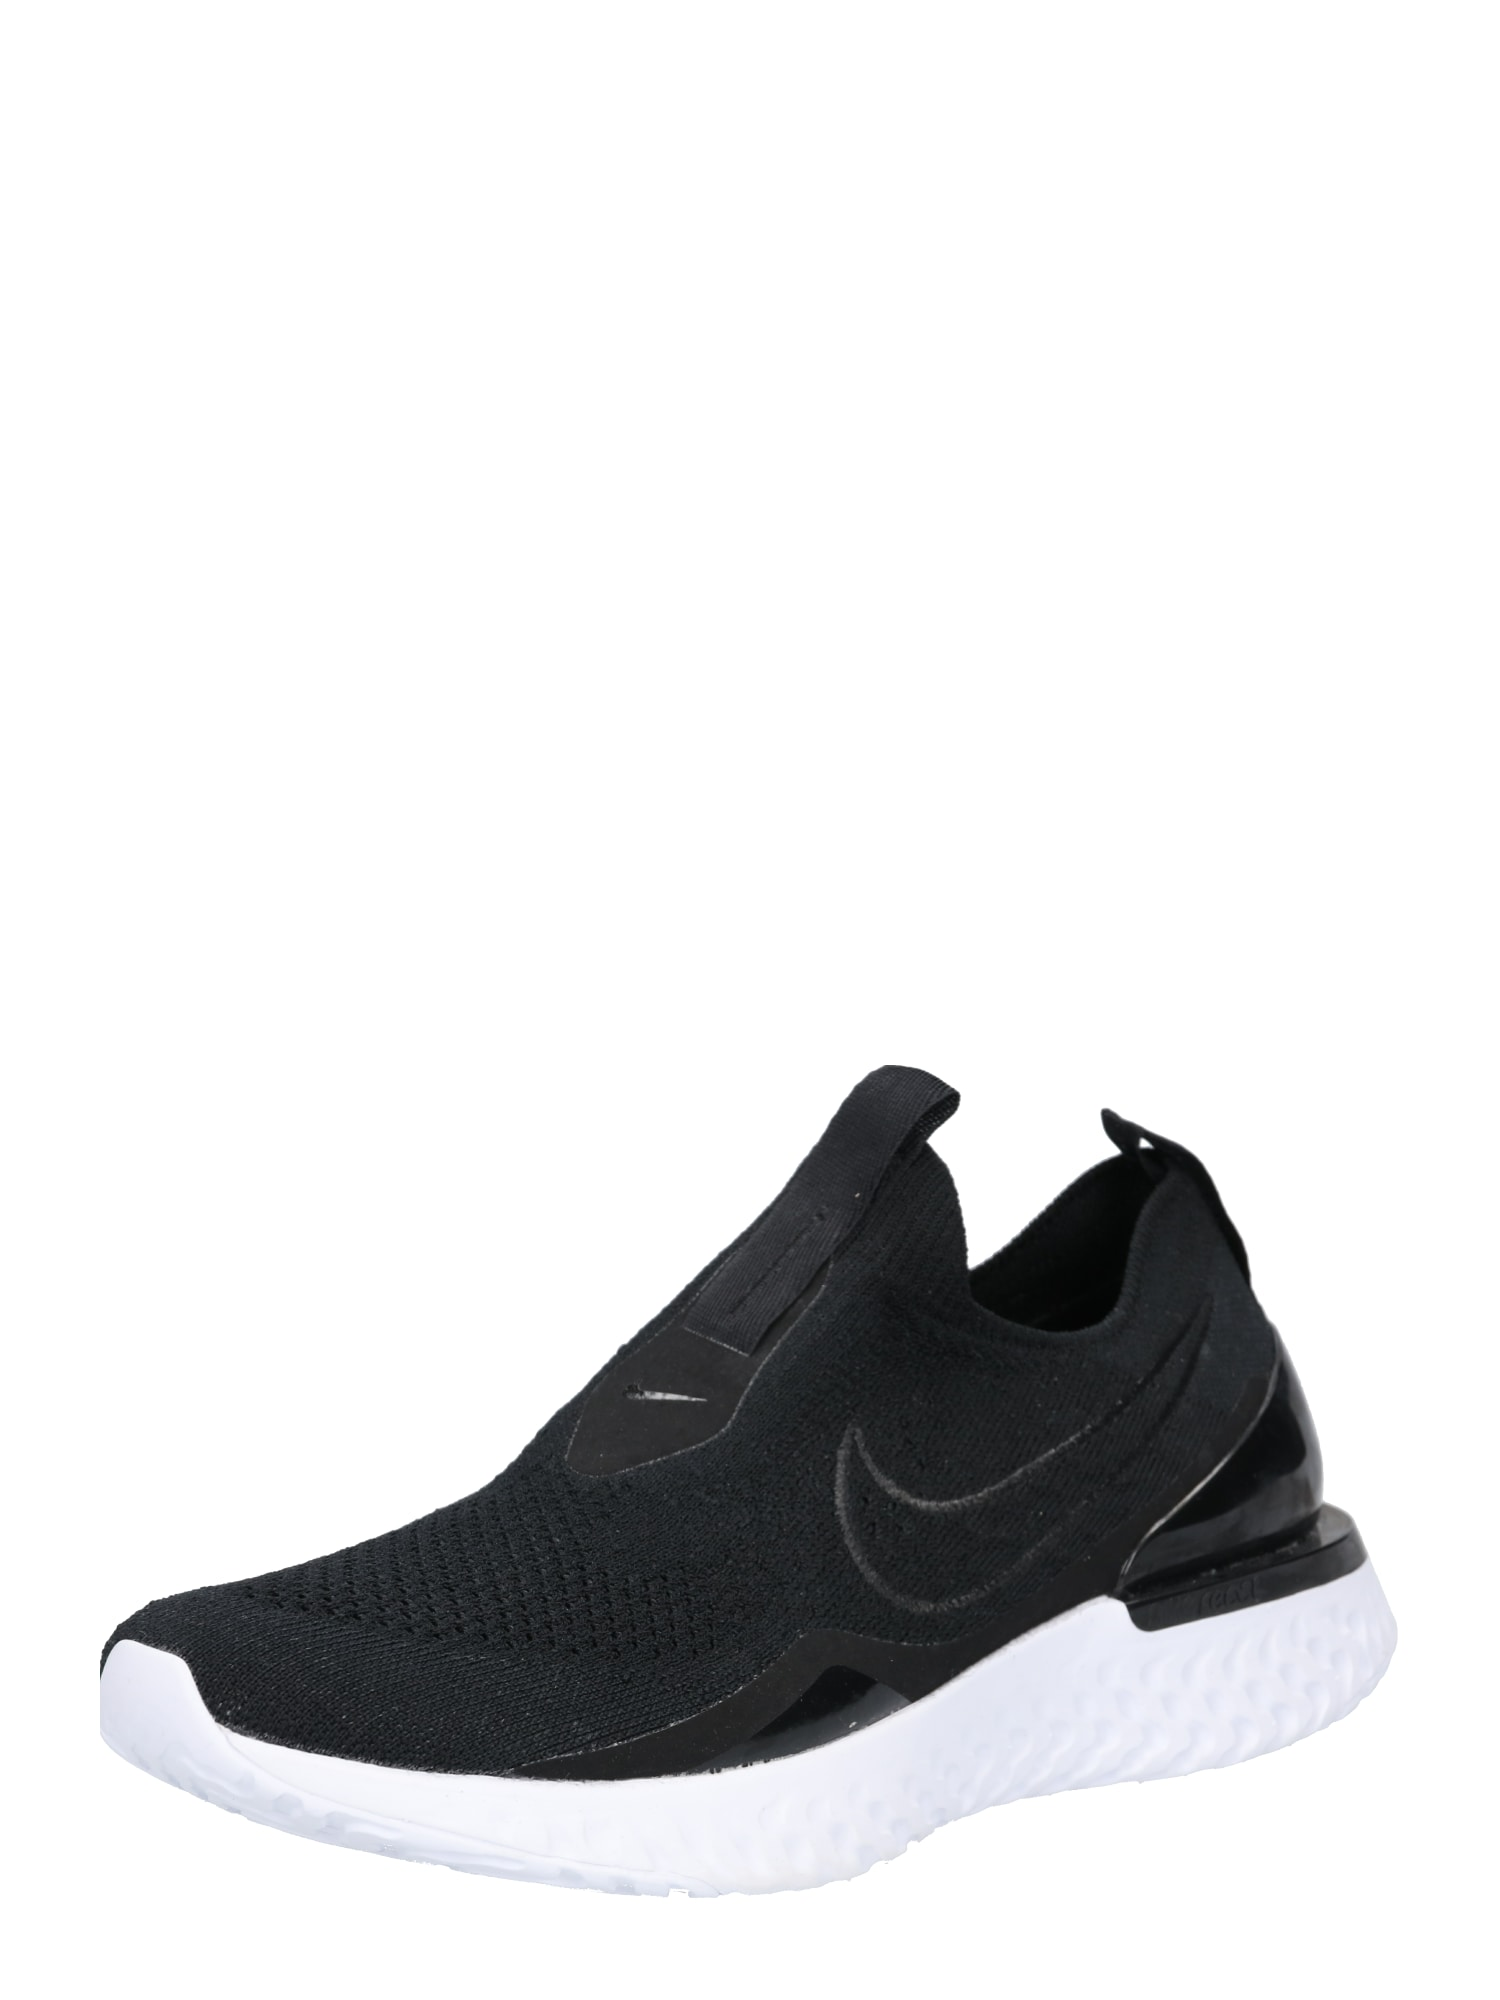 Sportovní boty W EPIC PHANTOM REACT FK černá bílá NIKE